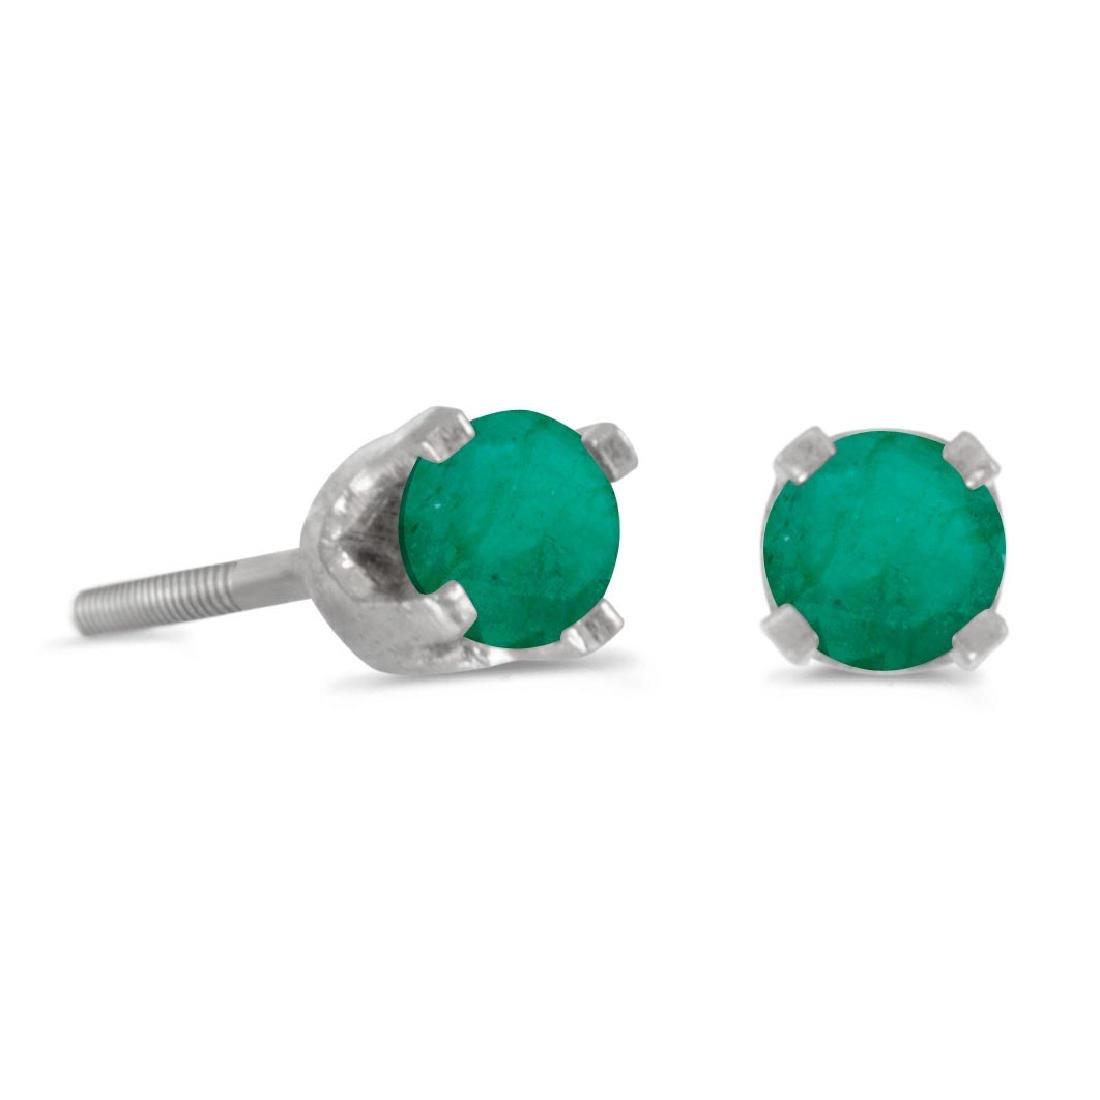 Certified 3 mm Petite Round Emerald Screw-back Stud Ear